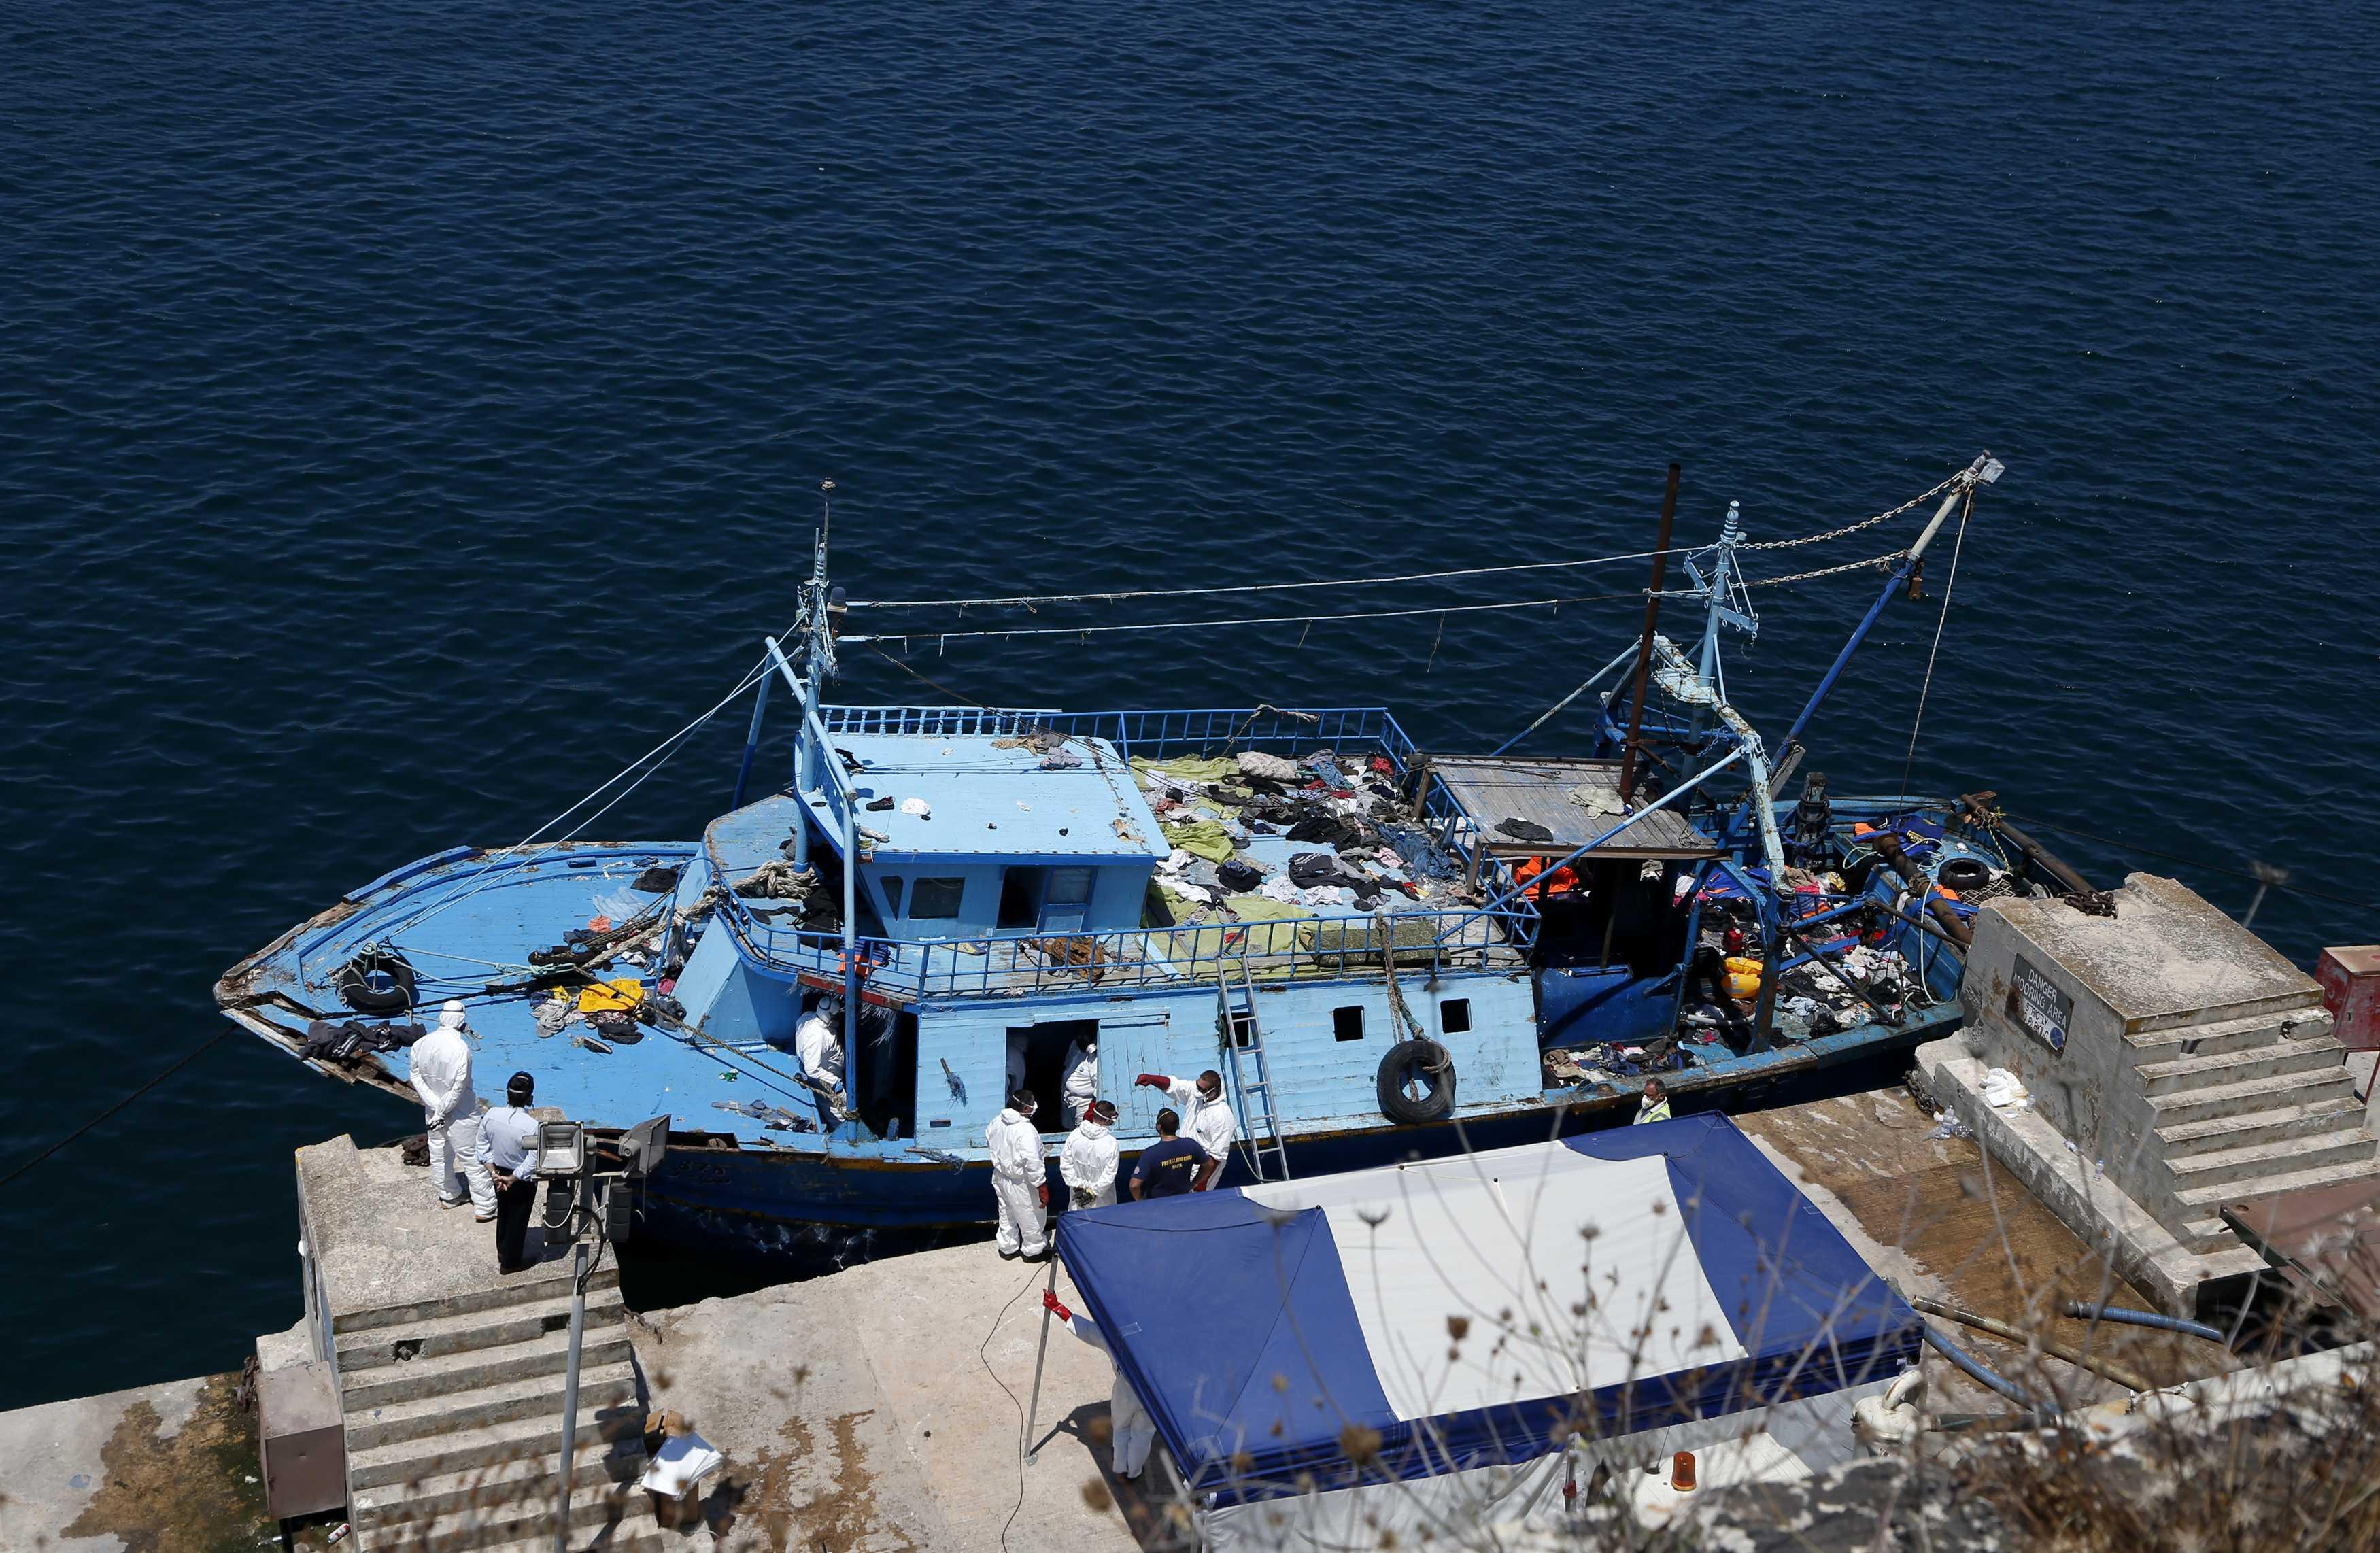 70 Ethiopian Migrants Drown in Shipwreck off Yemen Coast